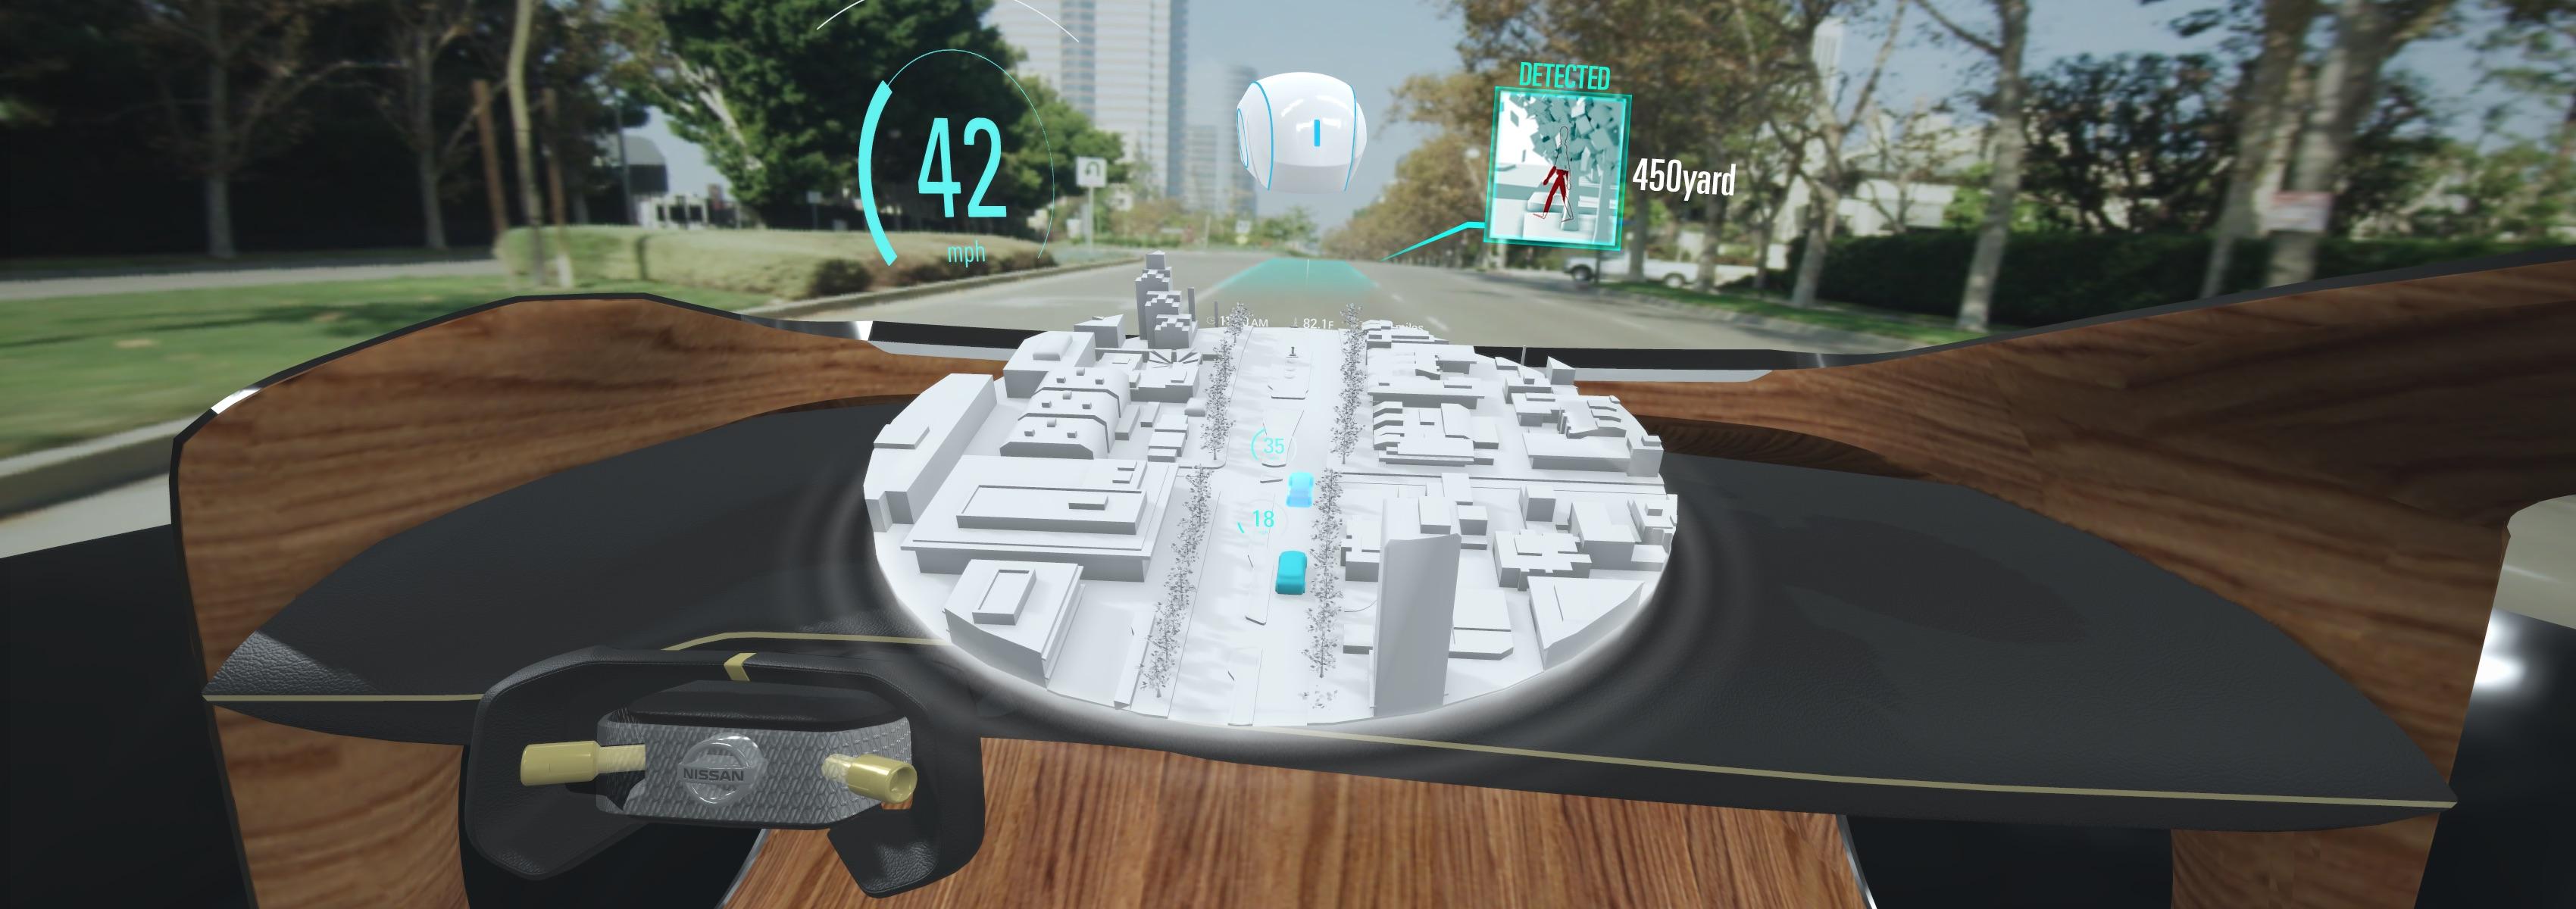 CES2019 | Nissan presentará su concepto de tecnología invisible a visible